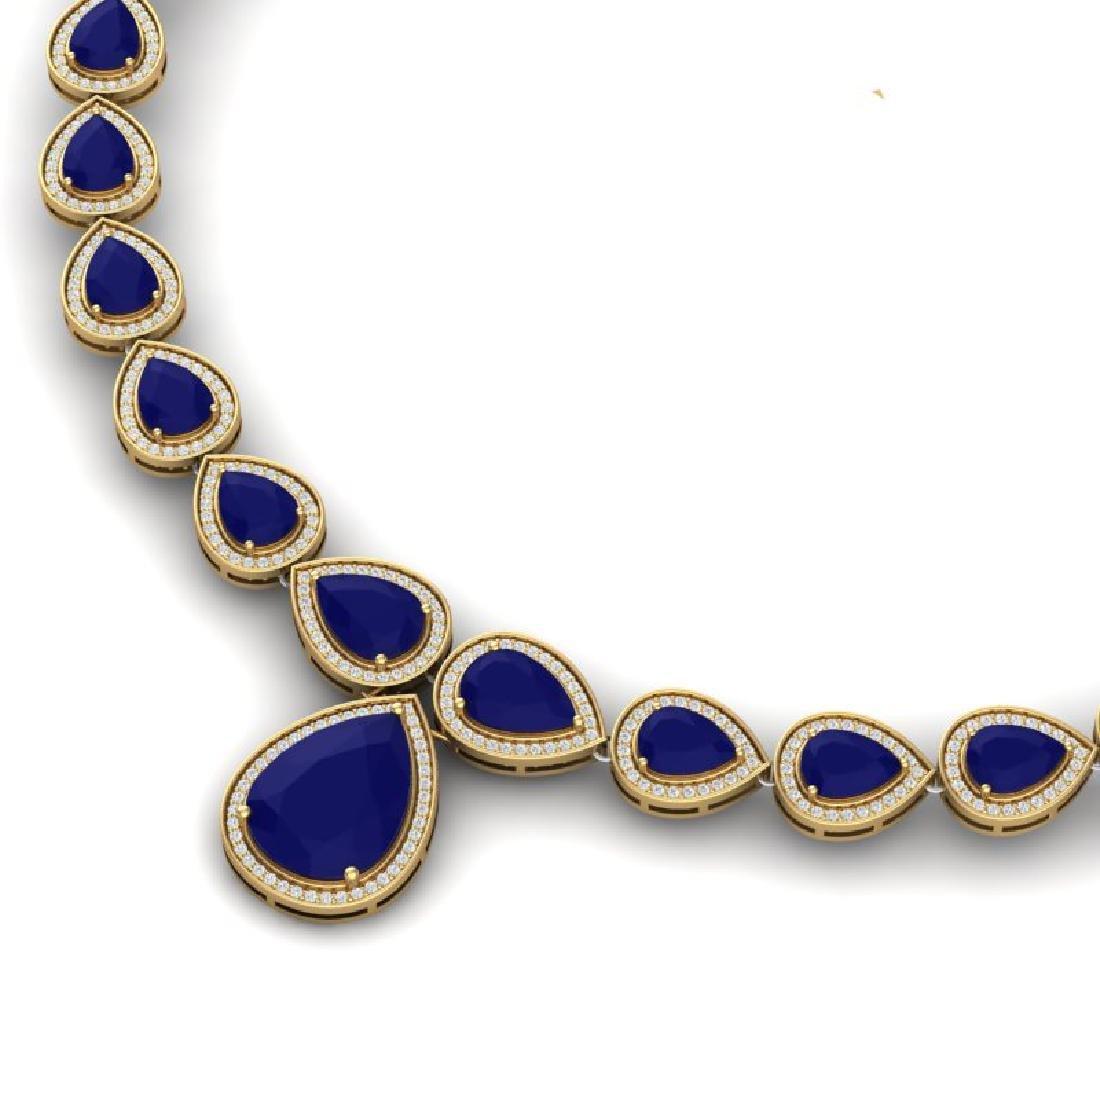 51.41 CTW Royalty Sapphire & VS Diamond Necklace 18K - 2